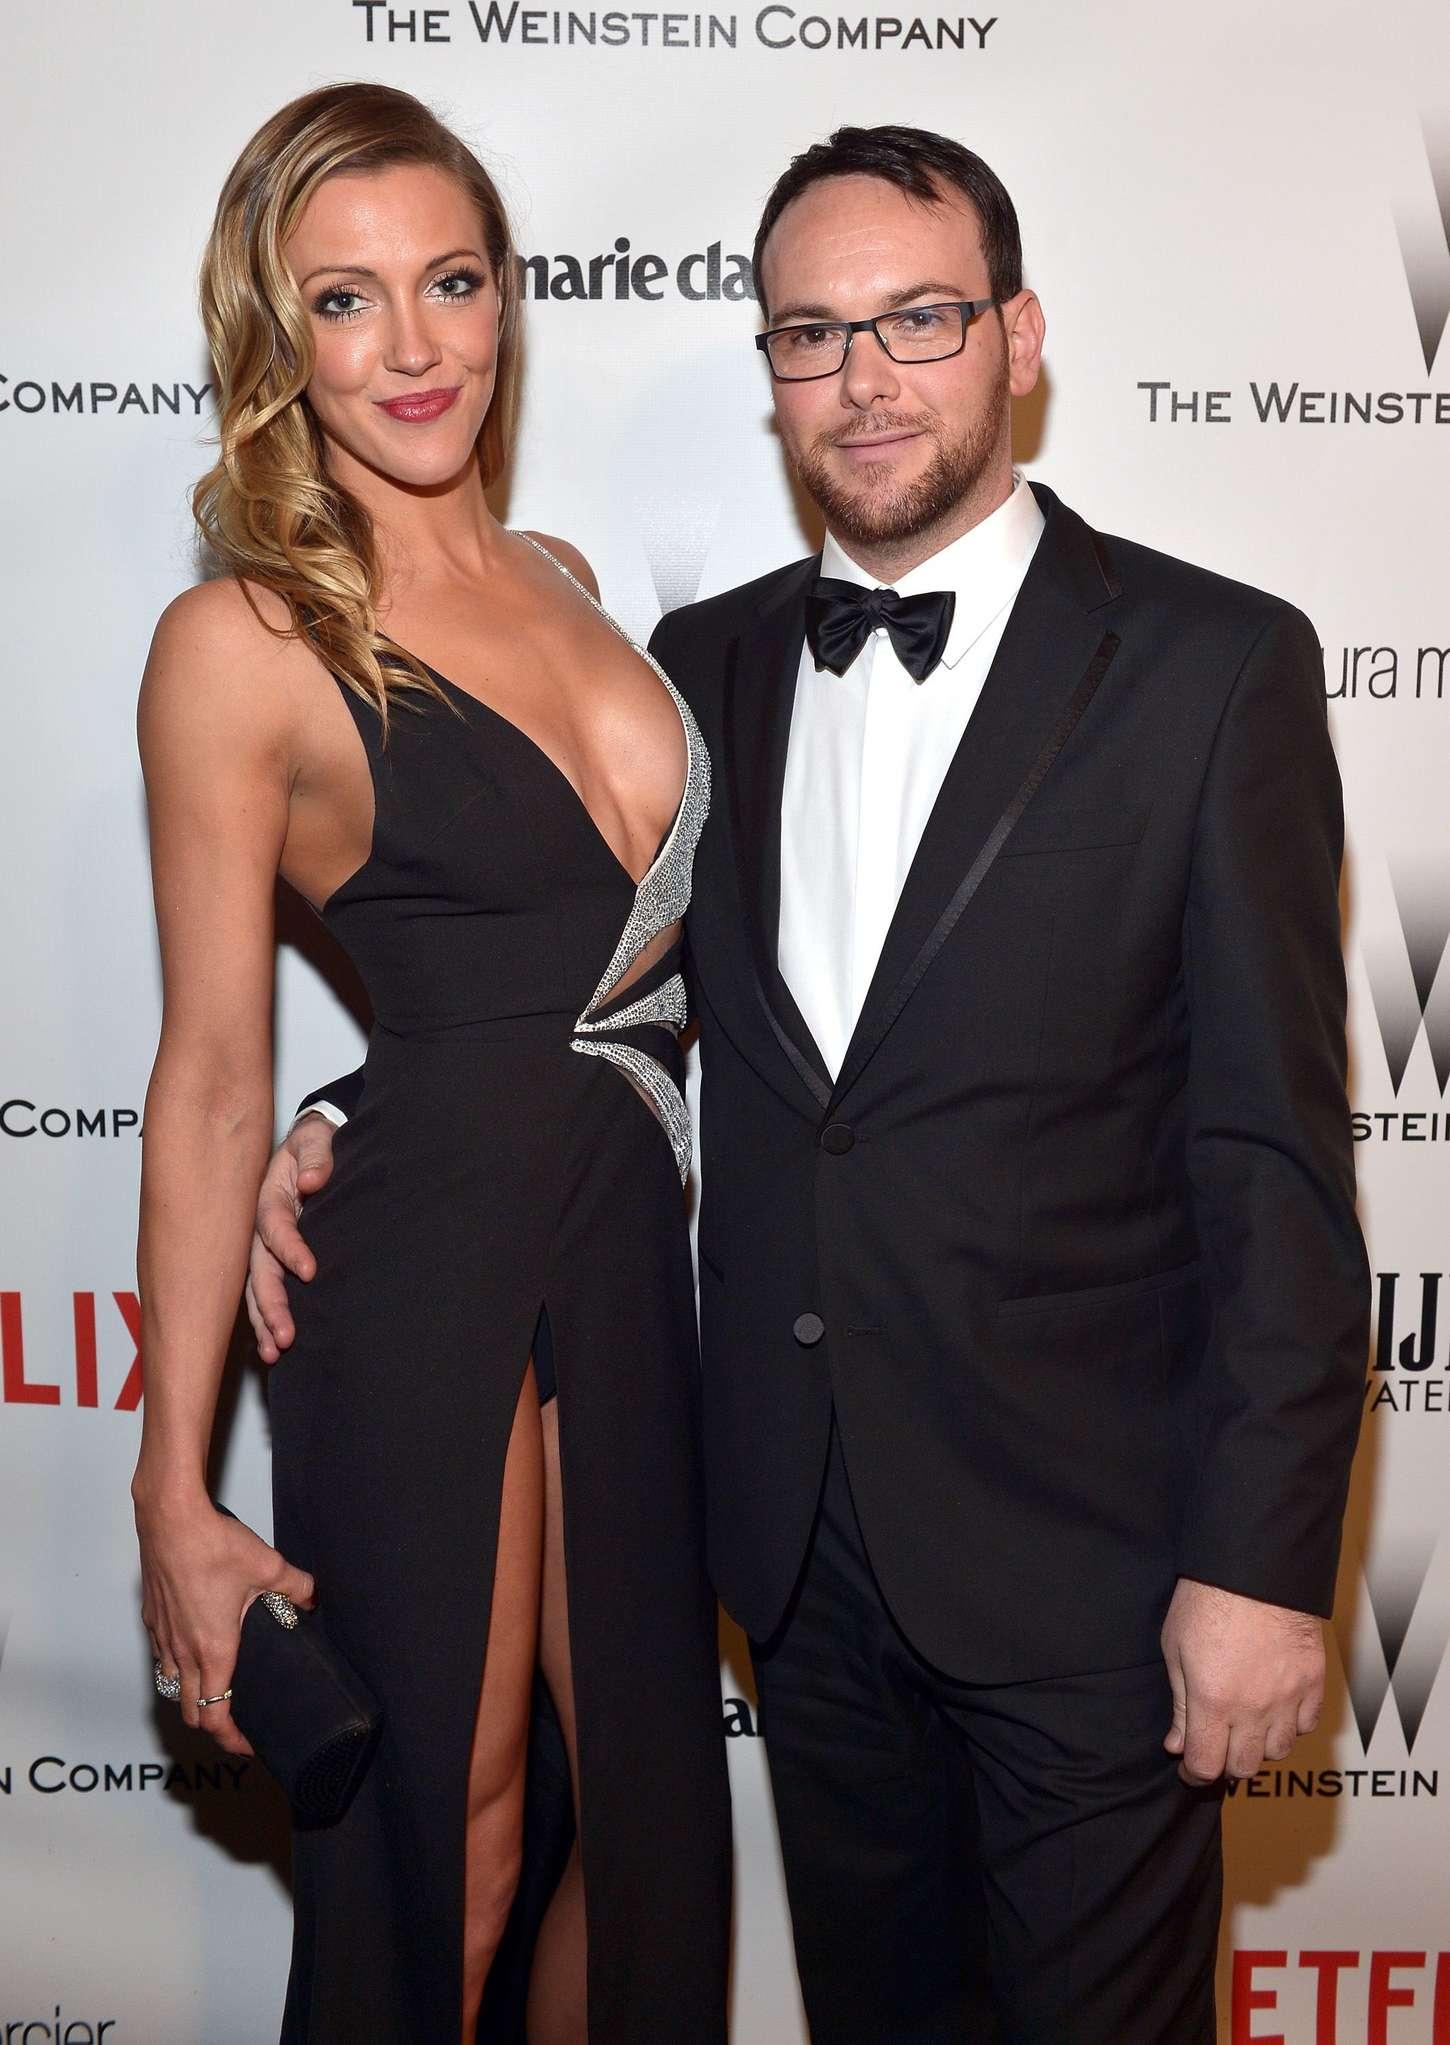 Katie Cassidy The Weinstein Company Netflixs Golden Globes Party in Beverly Hills